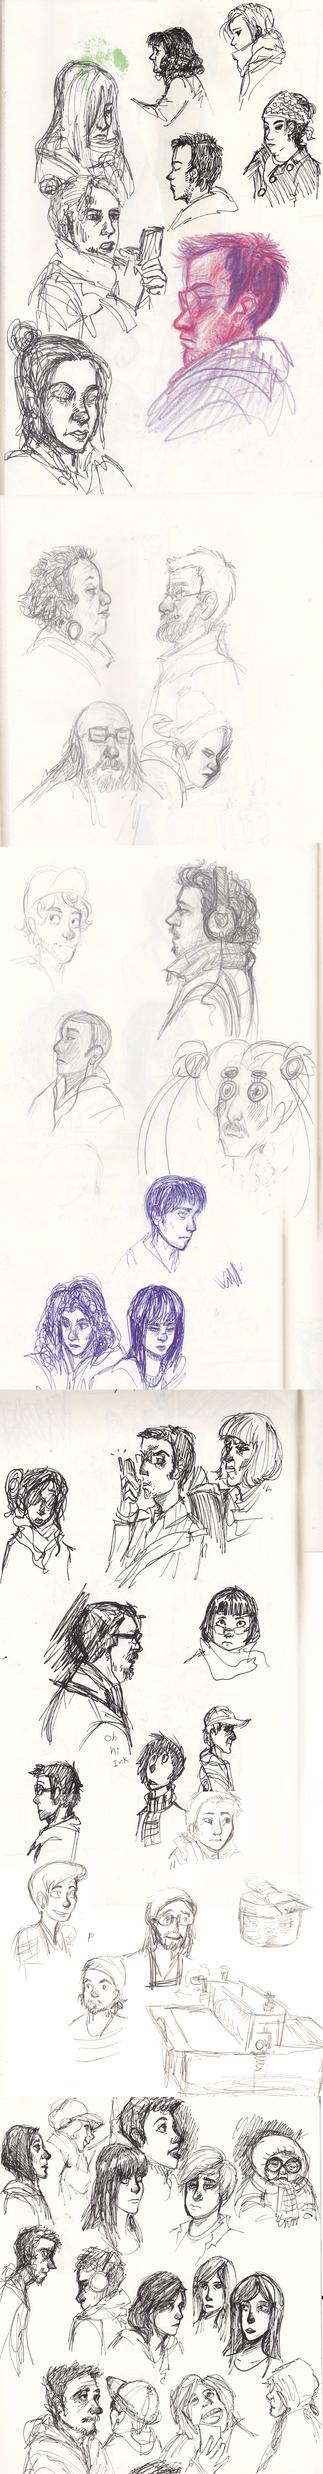 Observational Face Sketches by ArtistsBlood